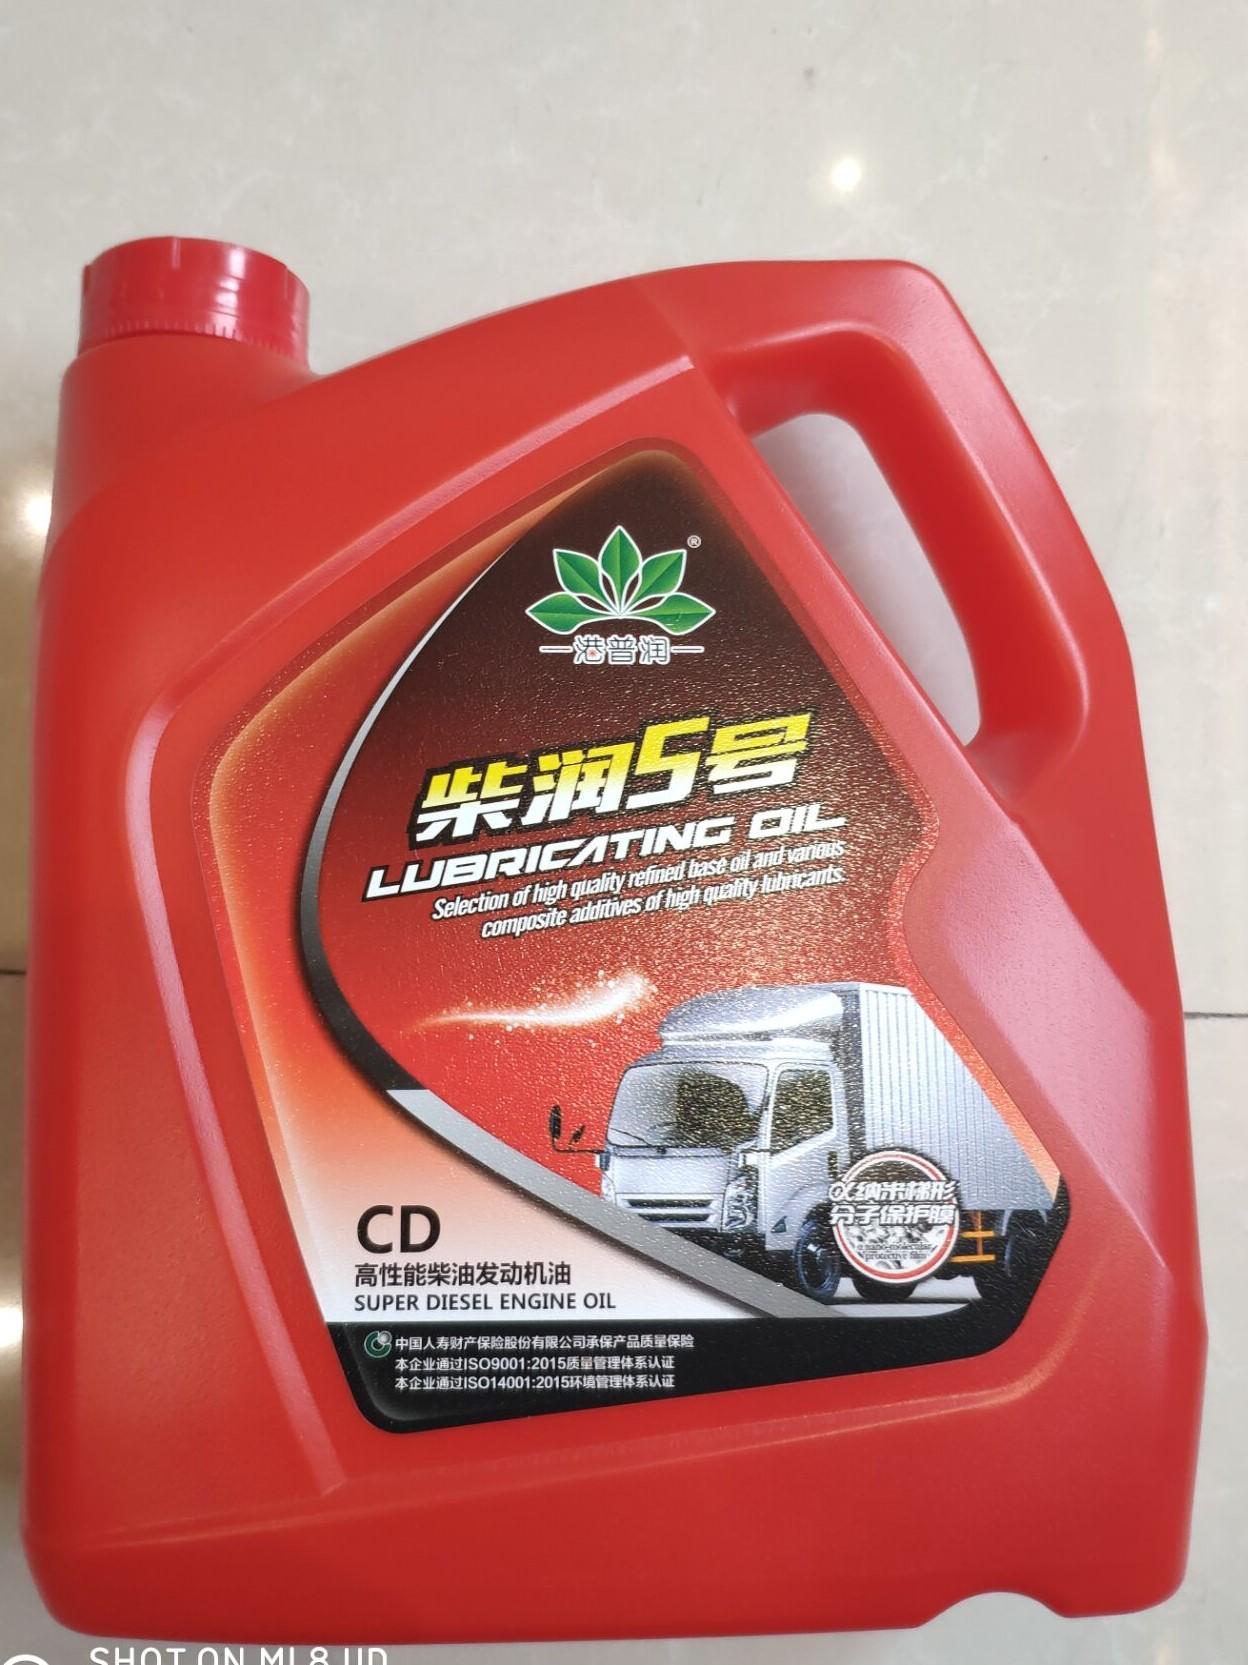 CD高性能柴油发动机油